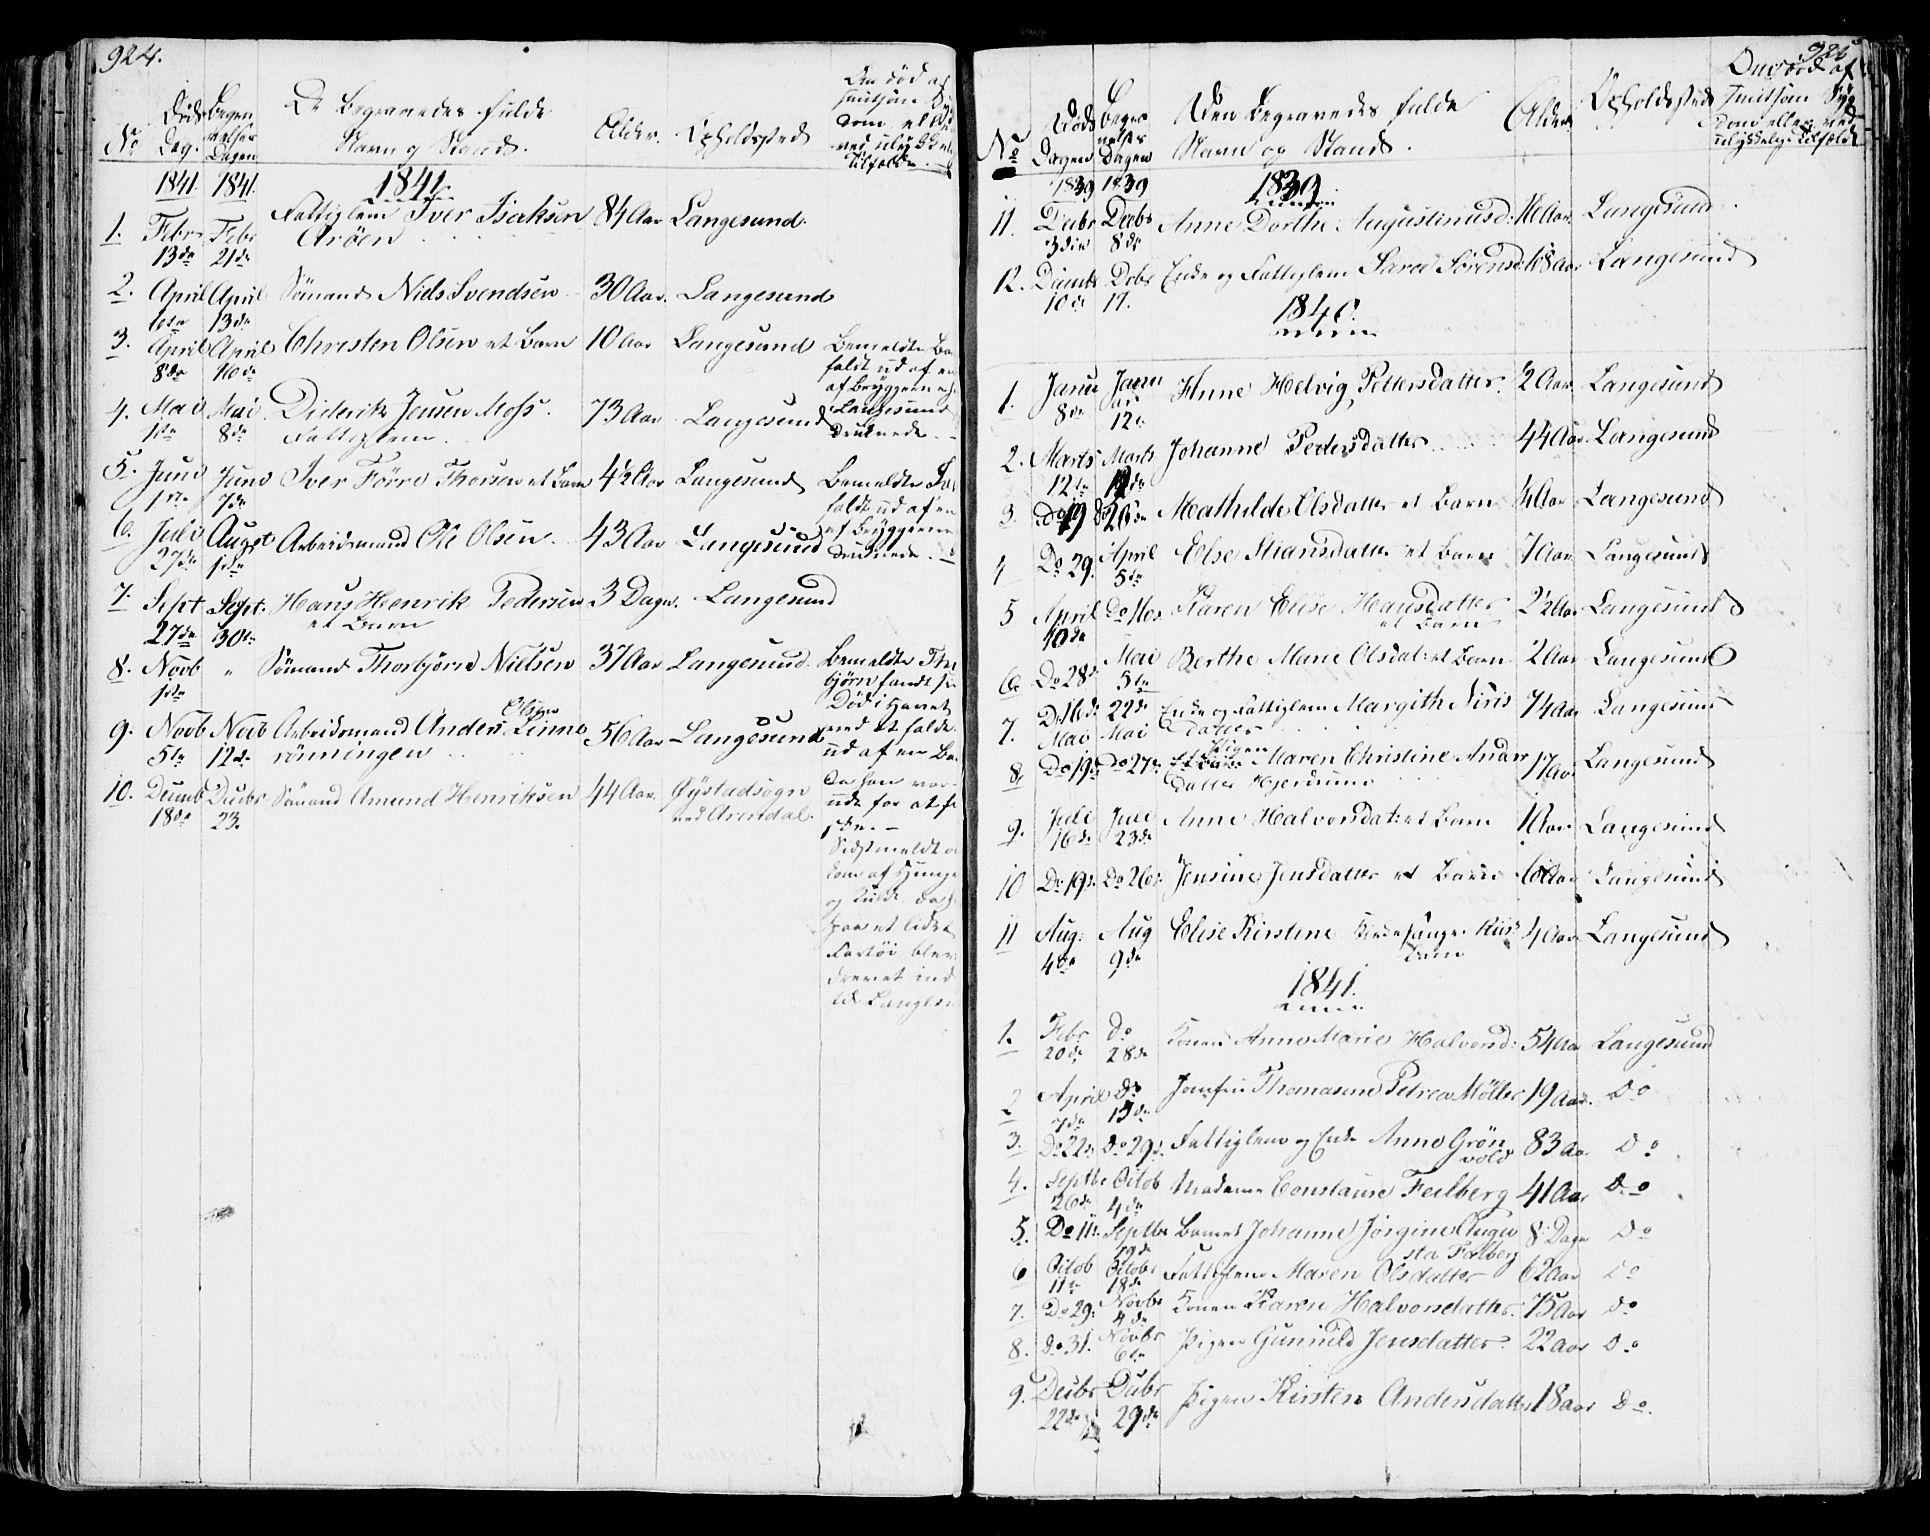 SAKO, Bamble kirkebøker, F/Fa/L0004: Ministerialbok nr. I 4, 1834-1853, s. 924-925